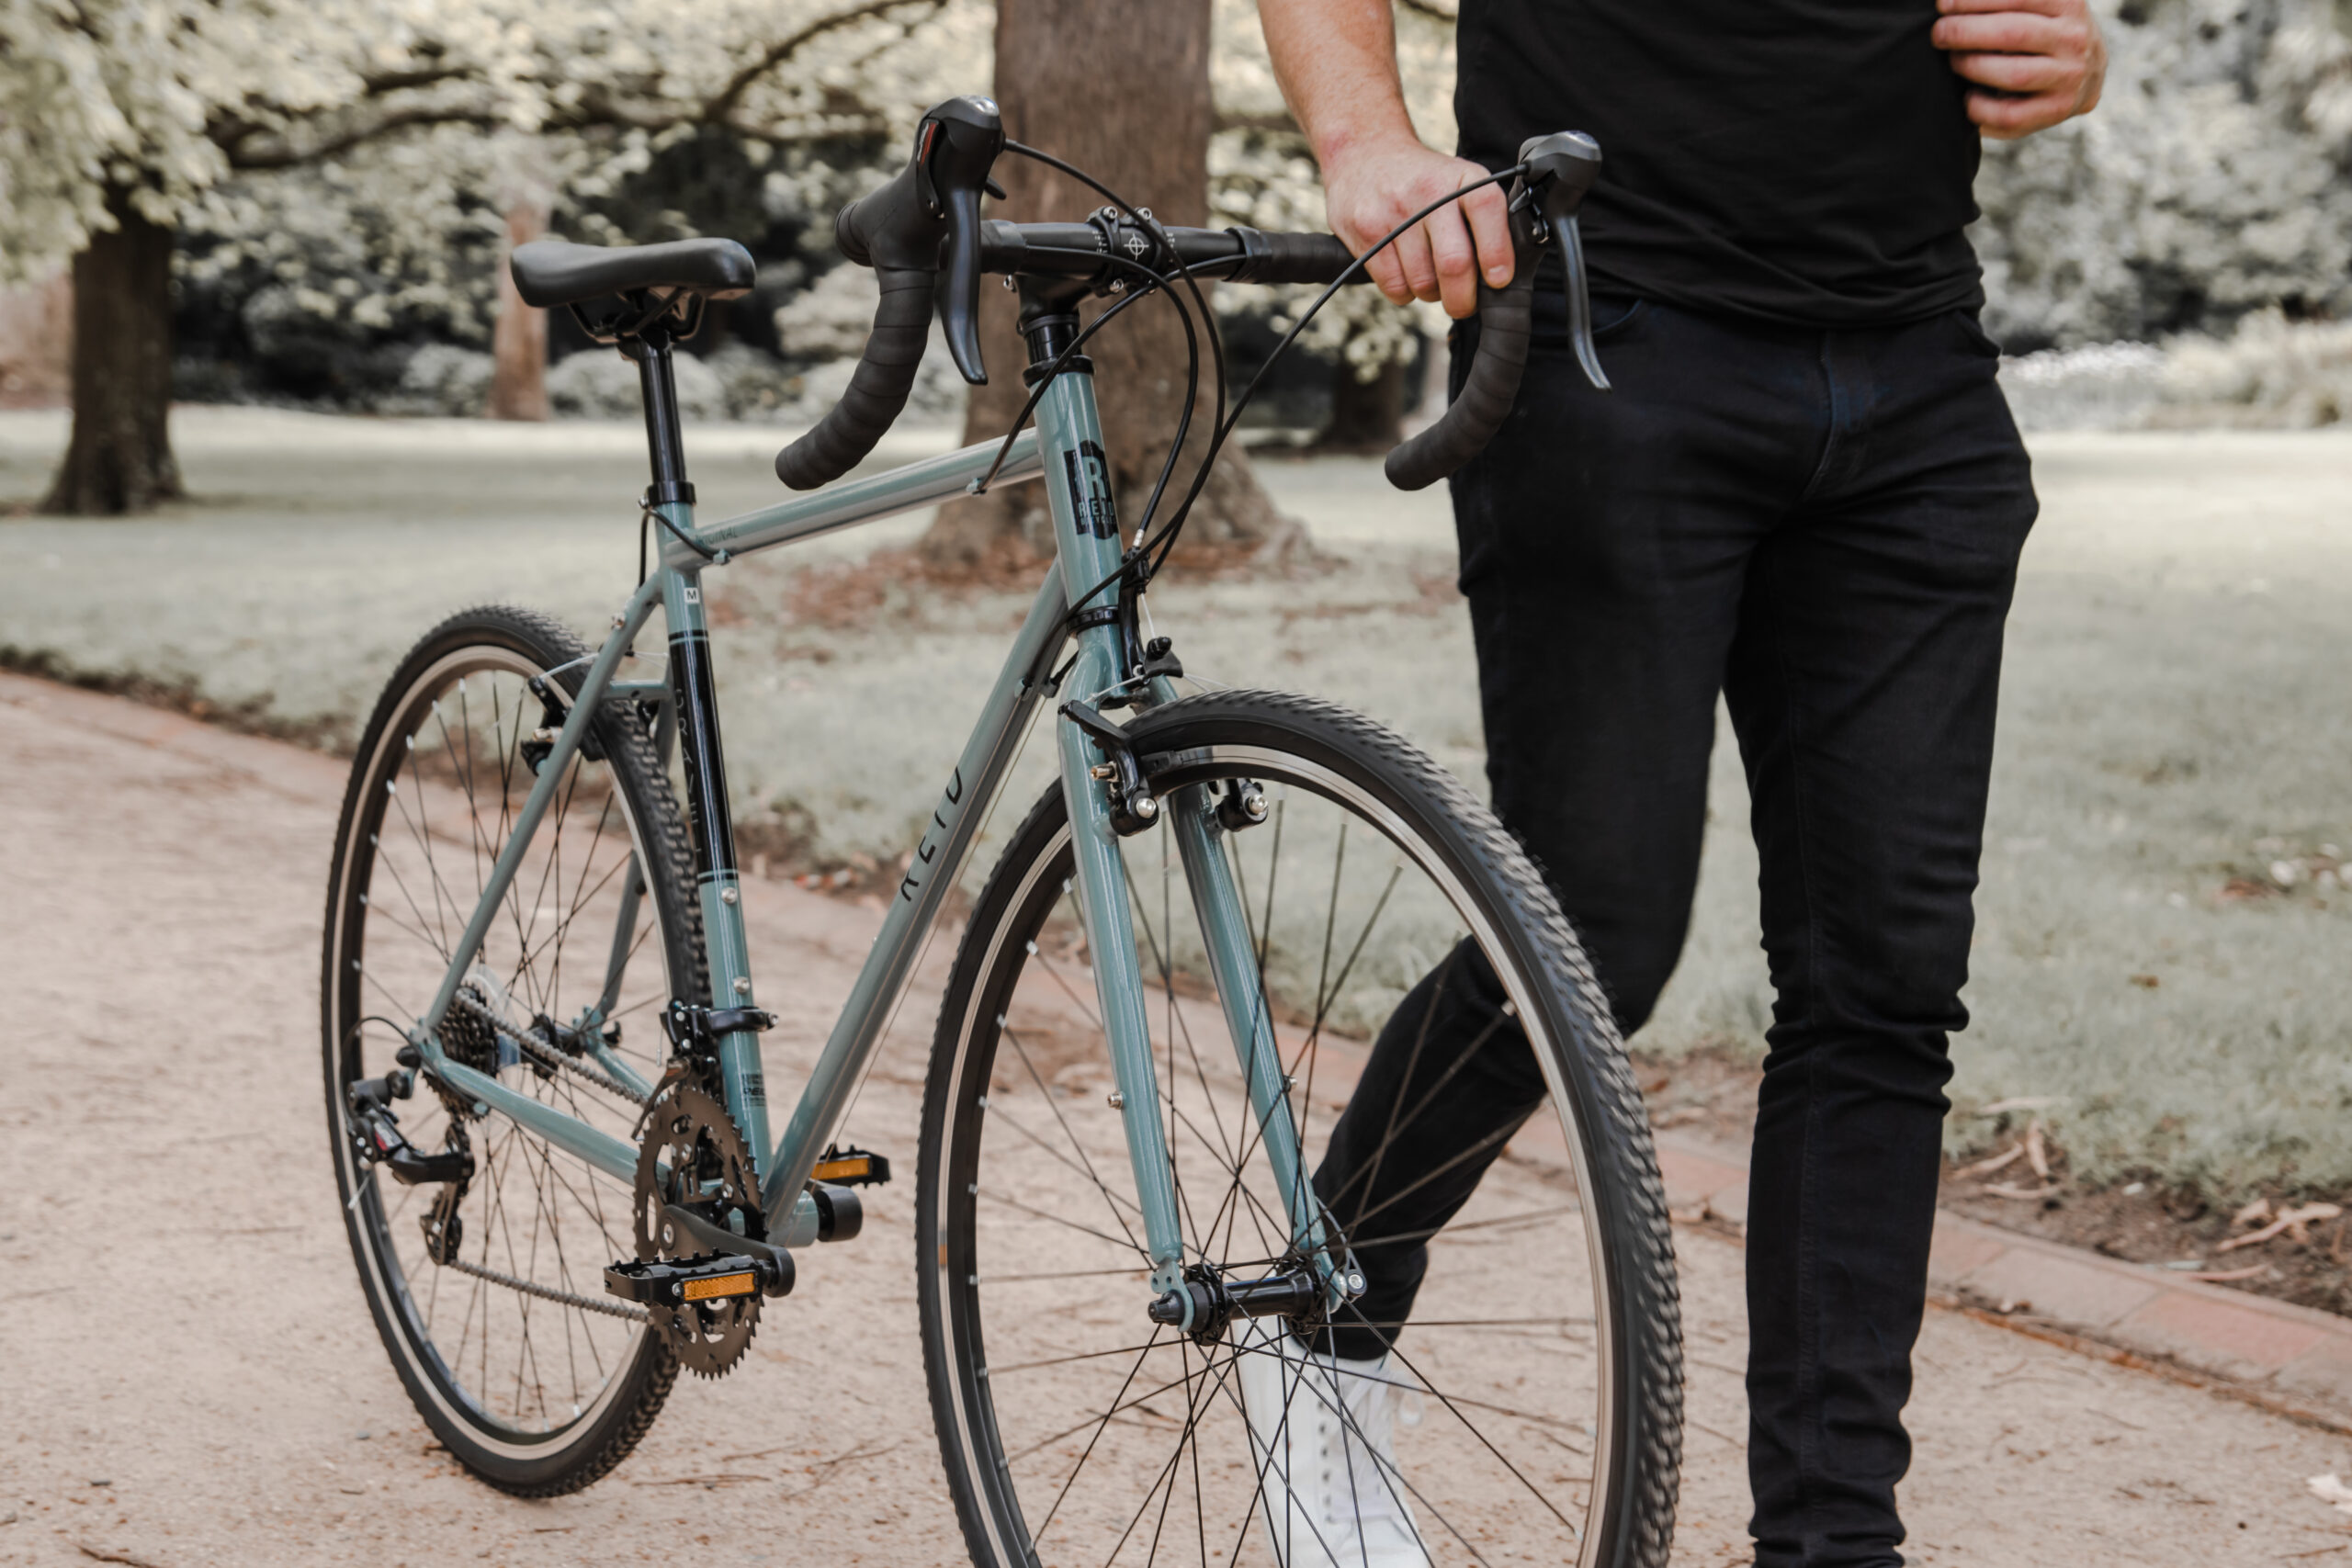 IMG 4263 scaled - Reid ® - Original Gravel Bike